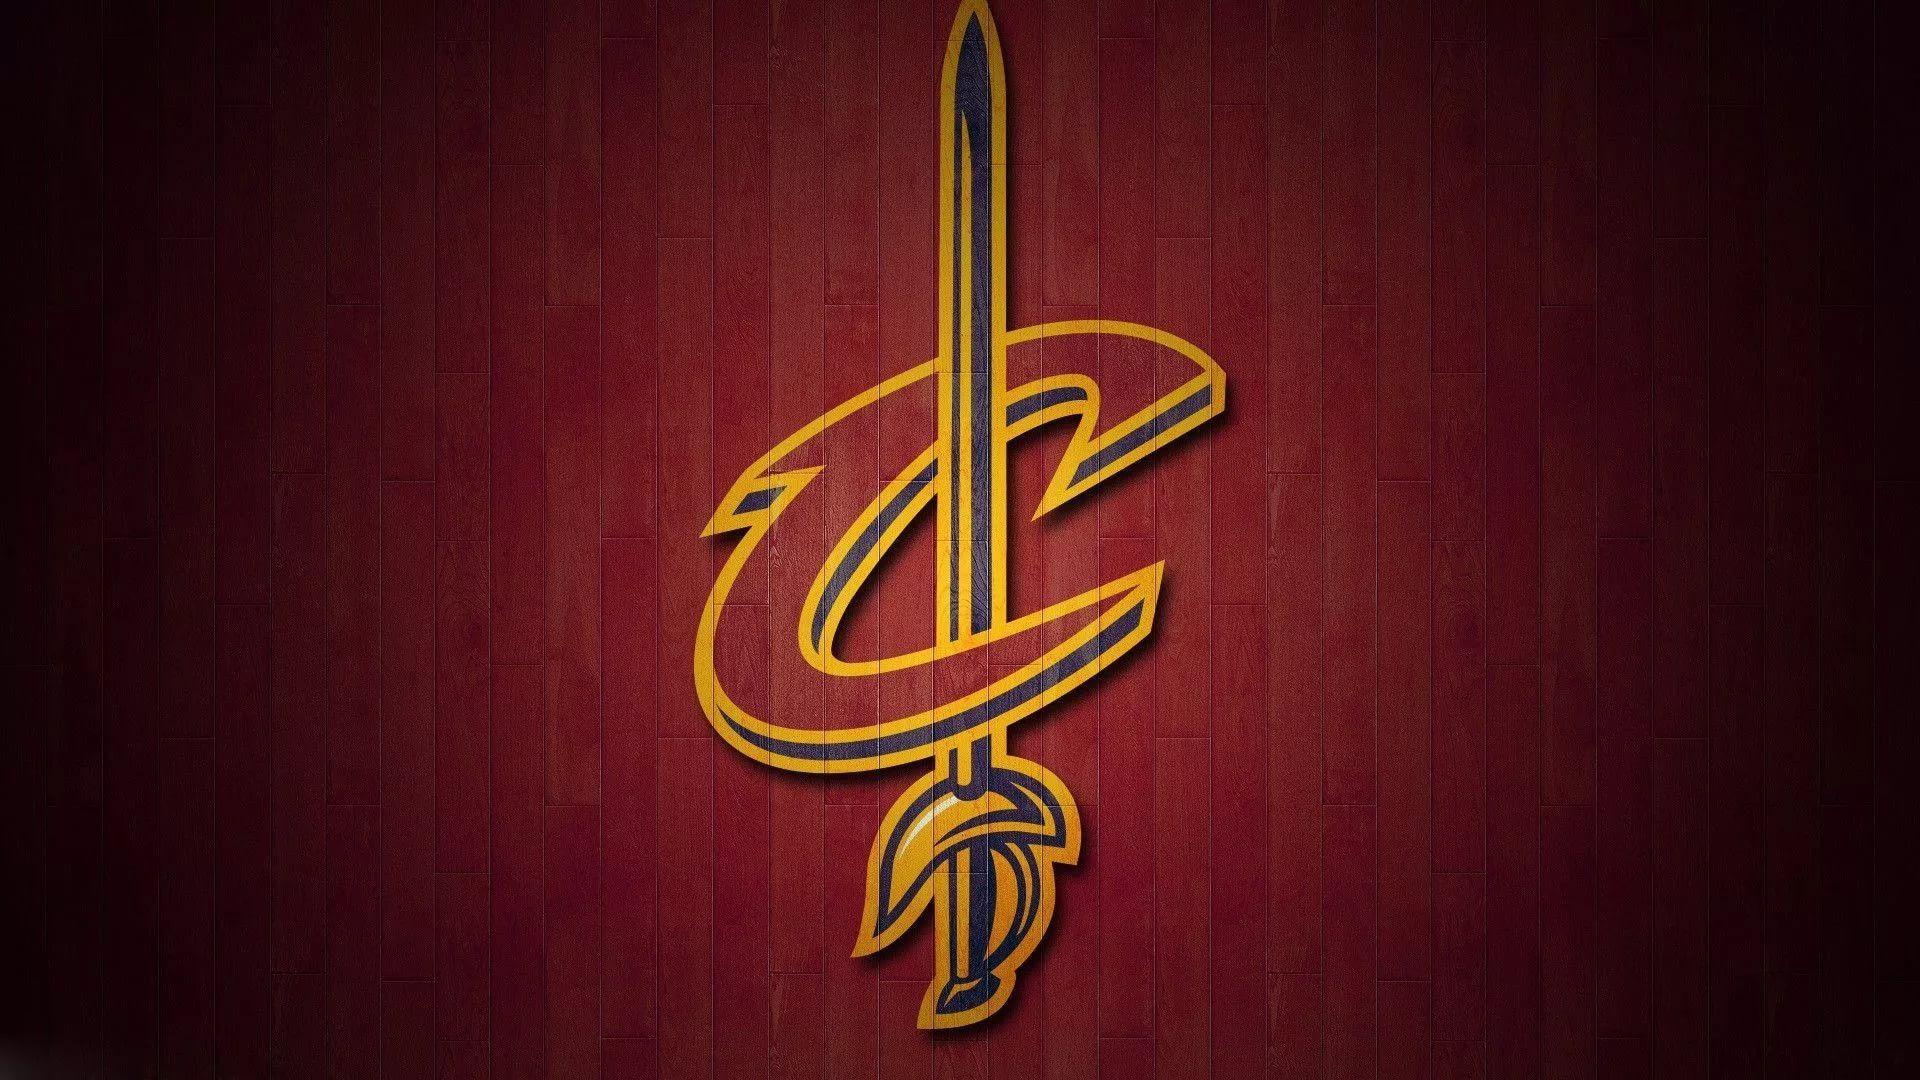 Cleveland wallpaper image hd